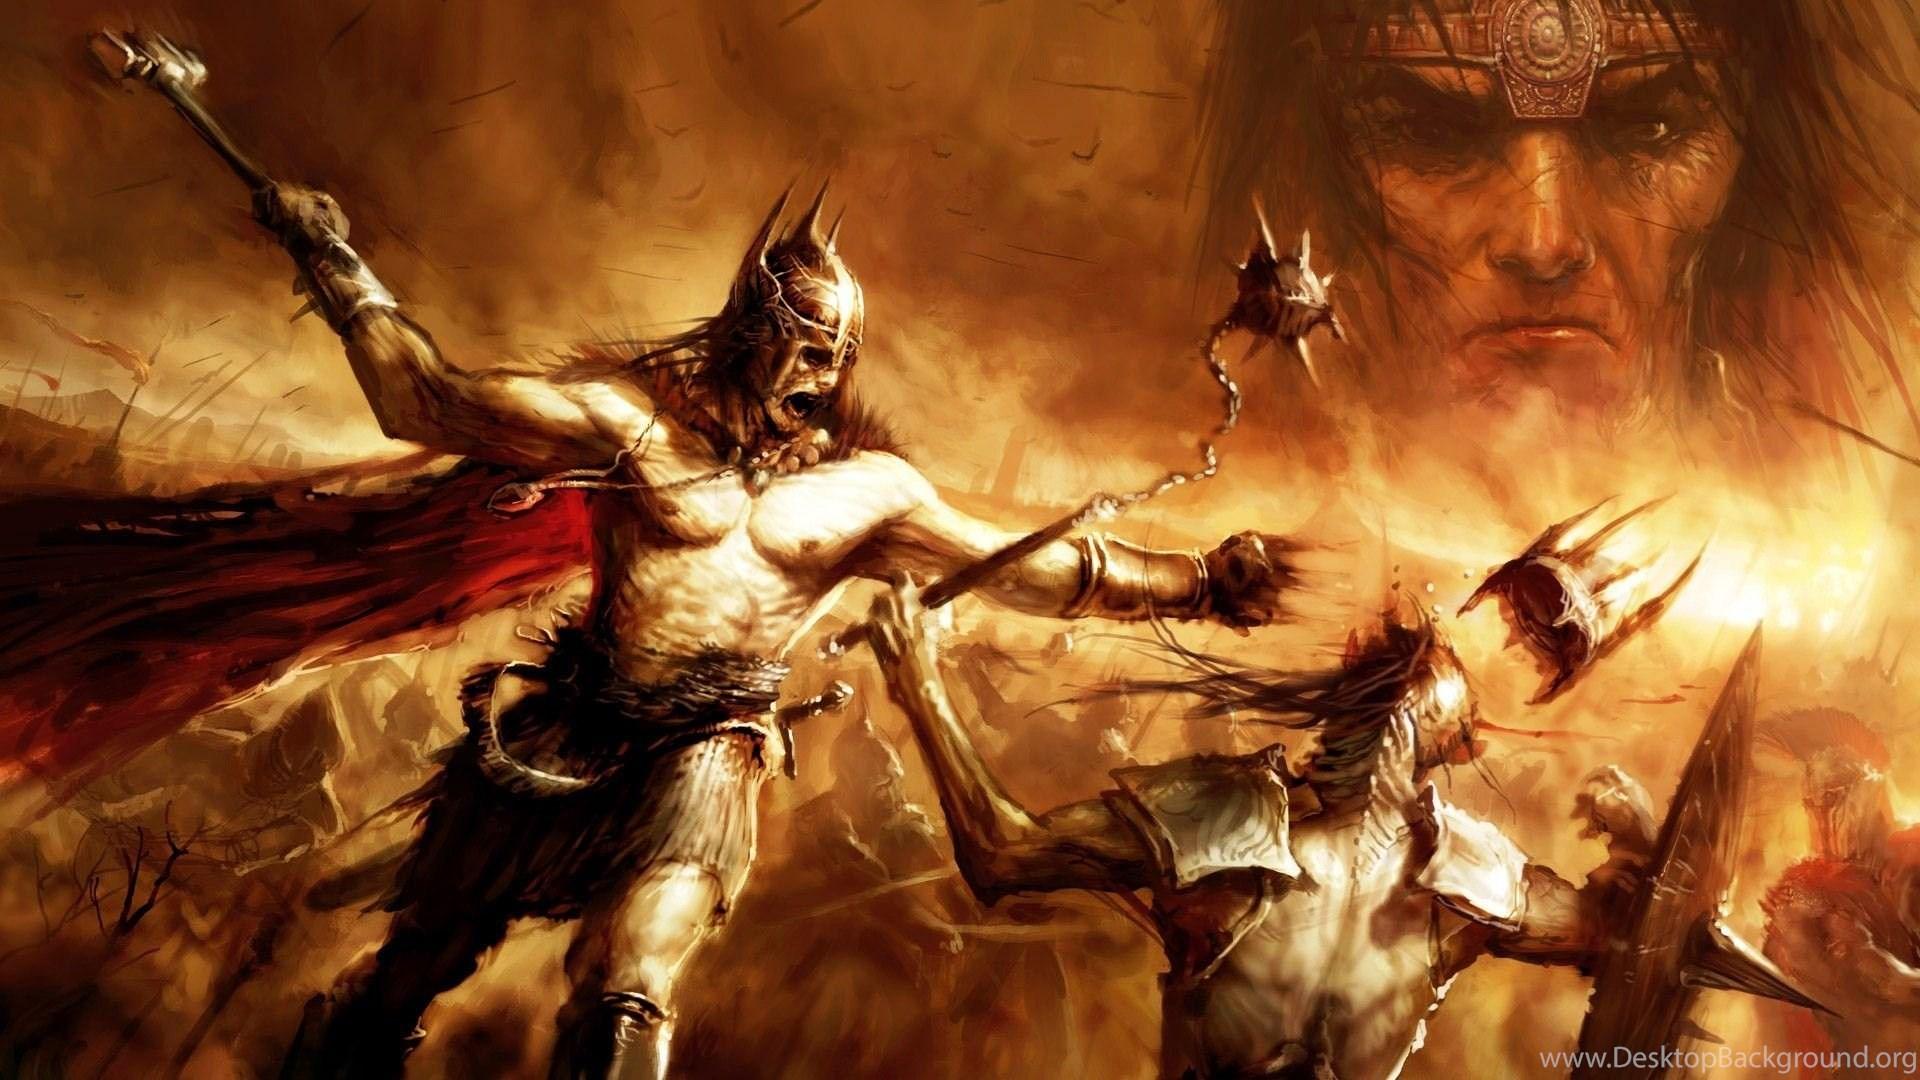 Gladiator wallpapers hd download desktop background popular voltagebd Gallery